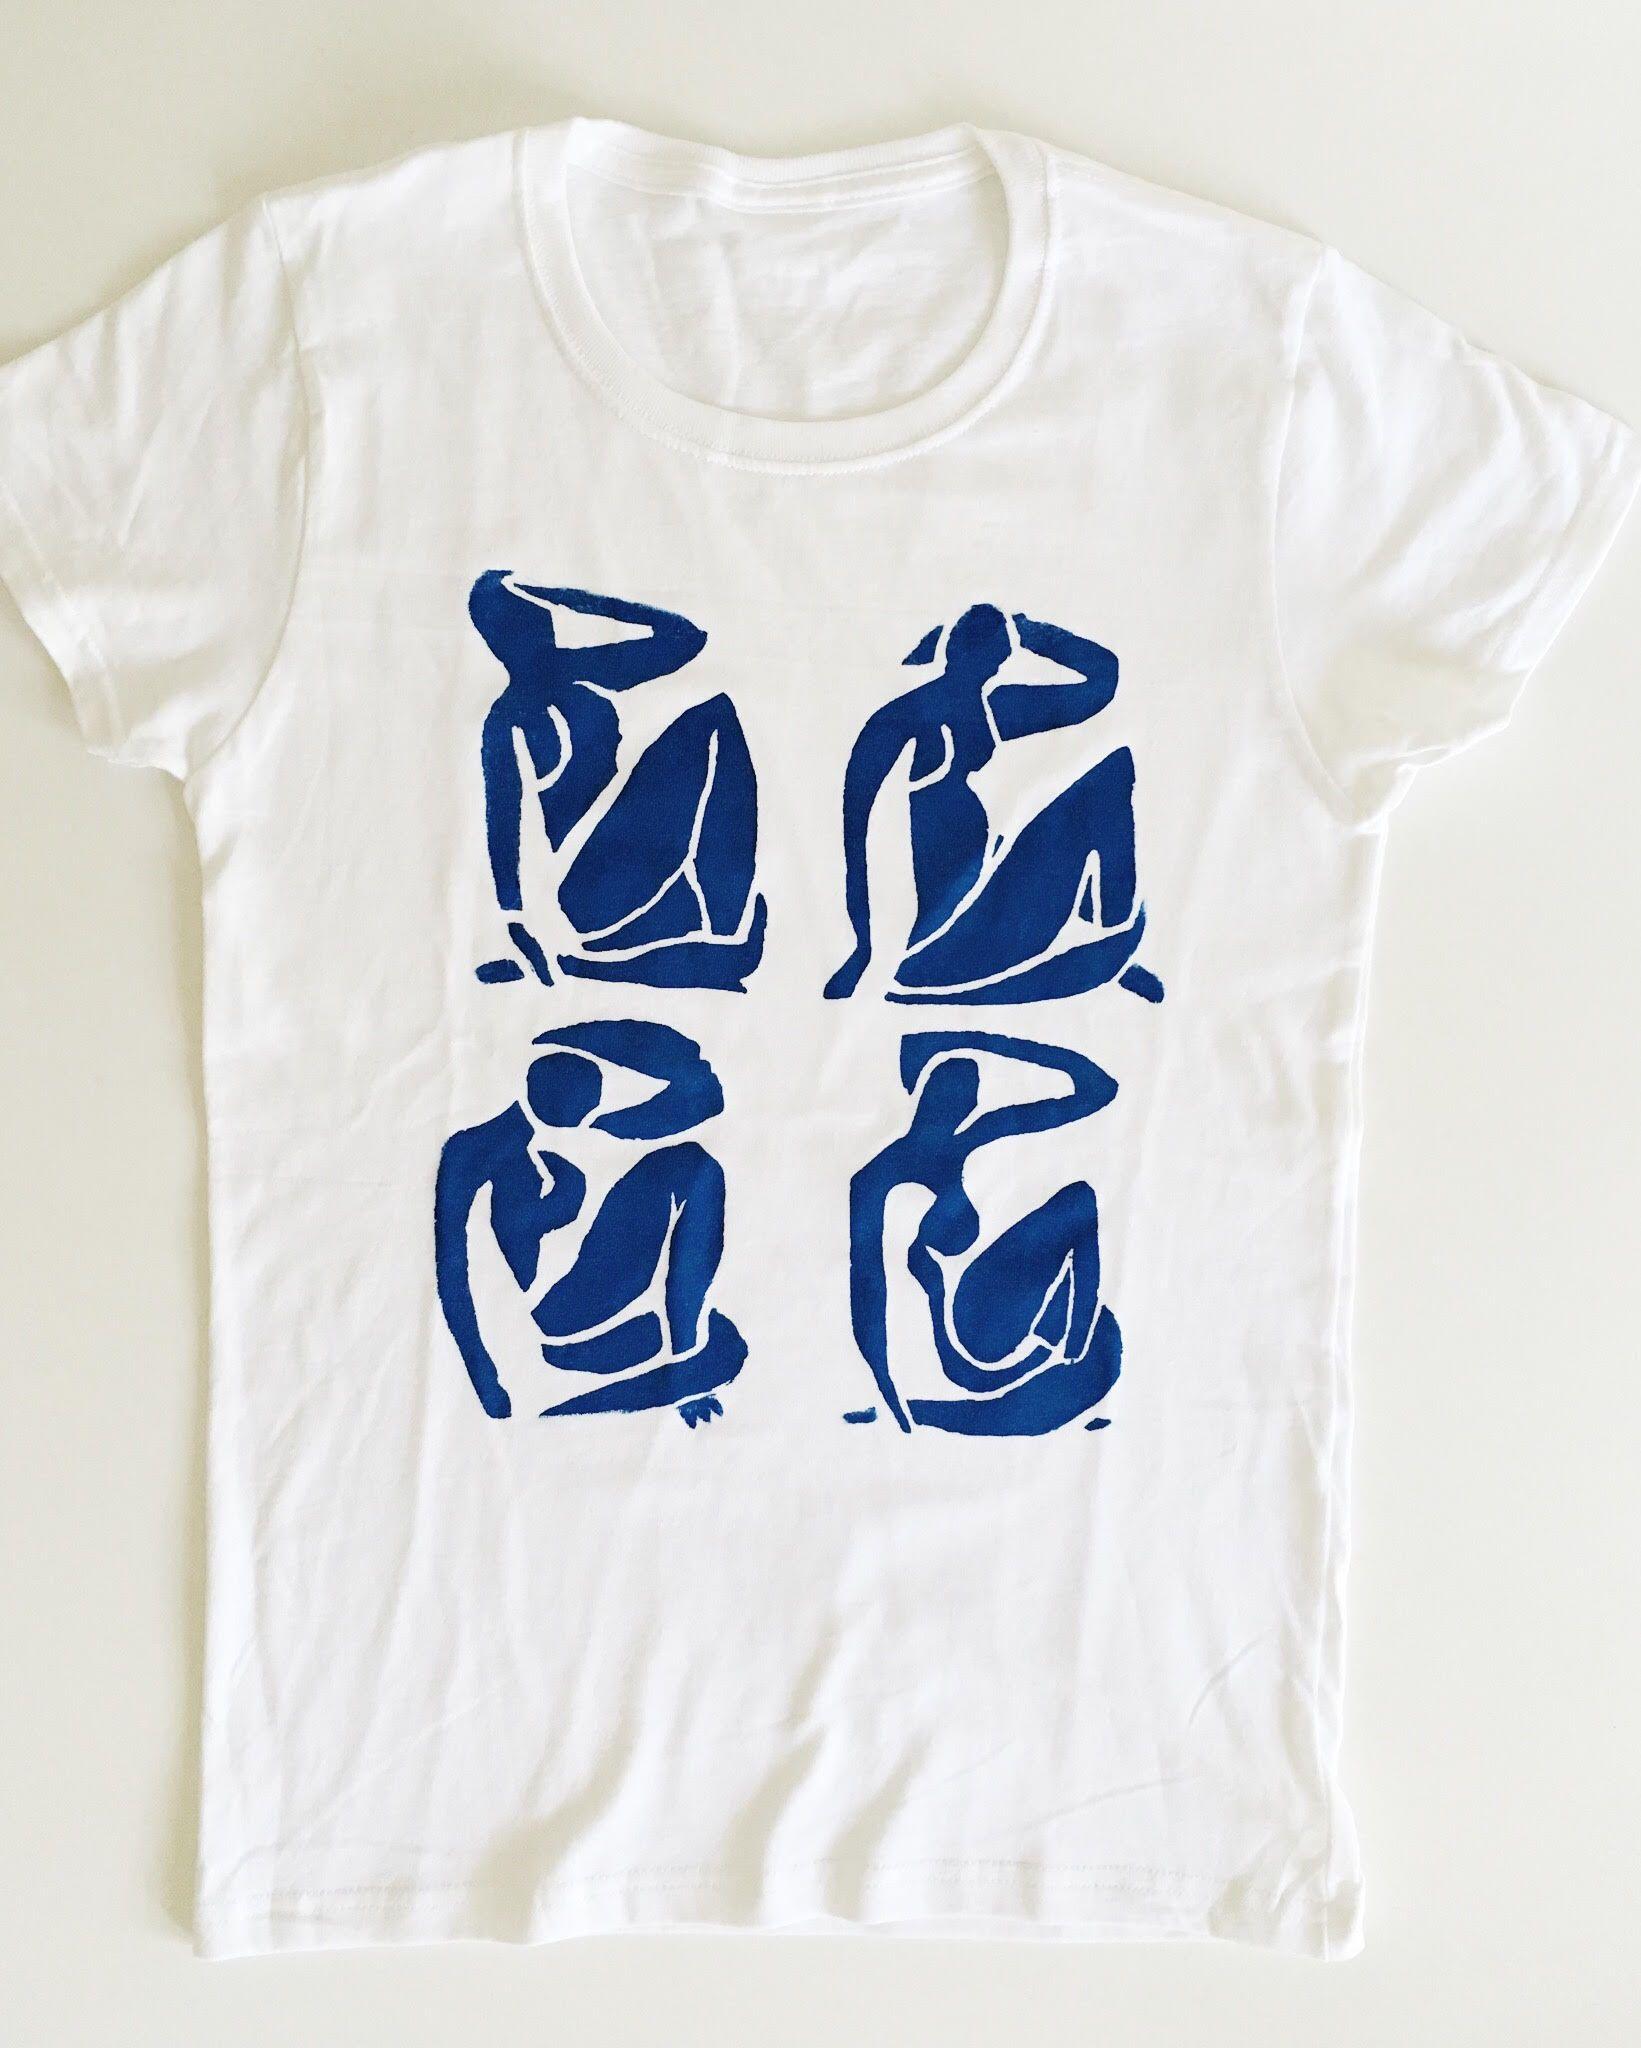 Matisse's Blue Nudes